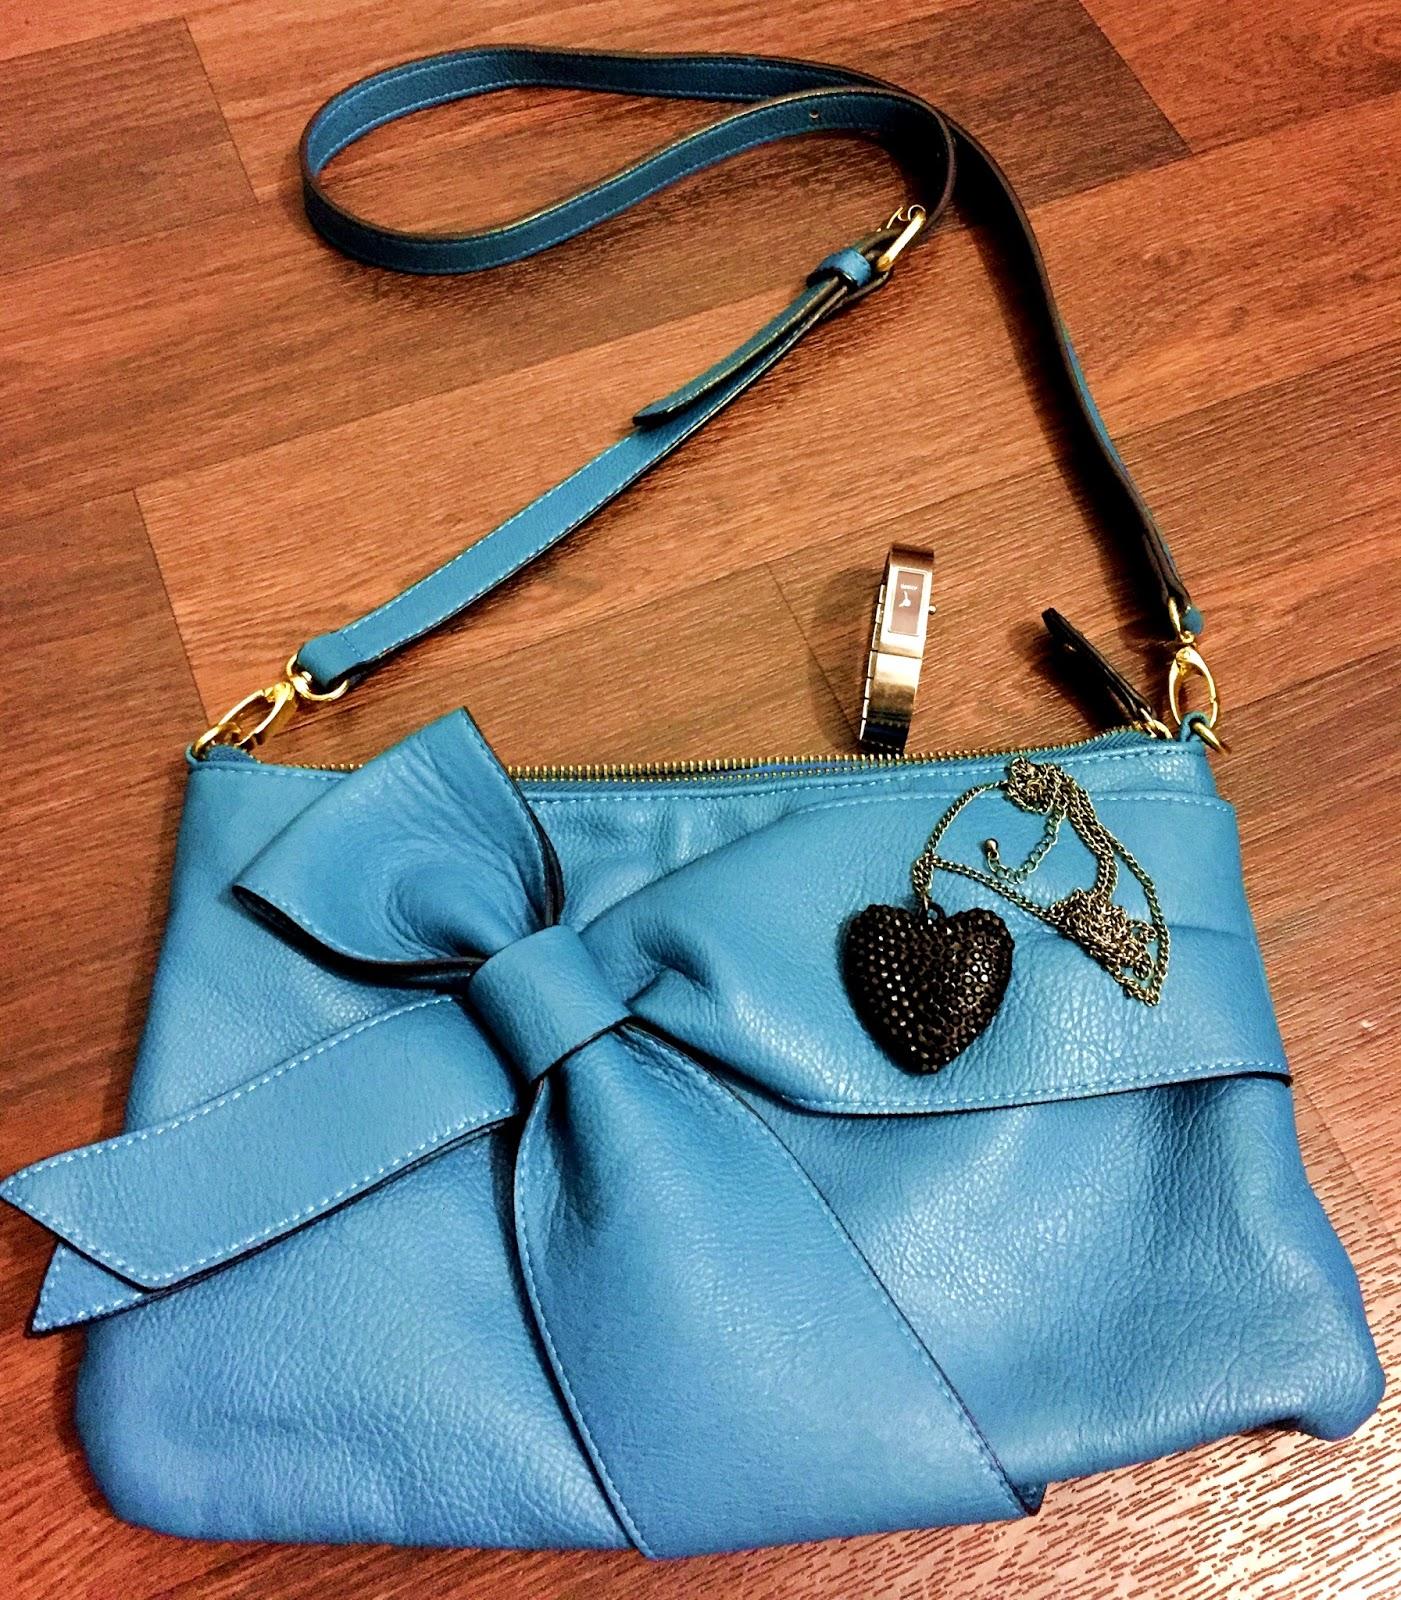 Fashion, Moda, Mohito necklace, New Look Dress, Peter Pan Collar Dress, Reserved bag, Styl, Outfit, Stylizacja, Adriana Style Blog, blog modowy Puławy, My Personal Style